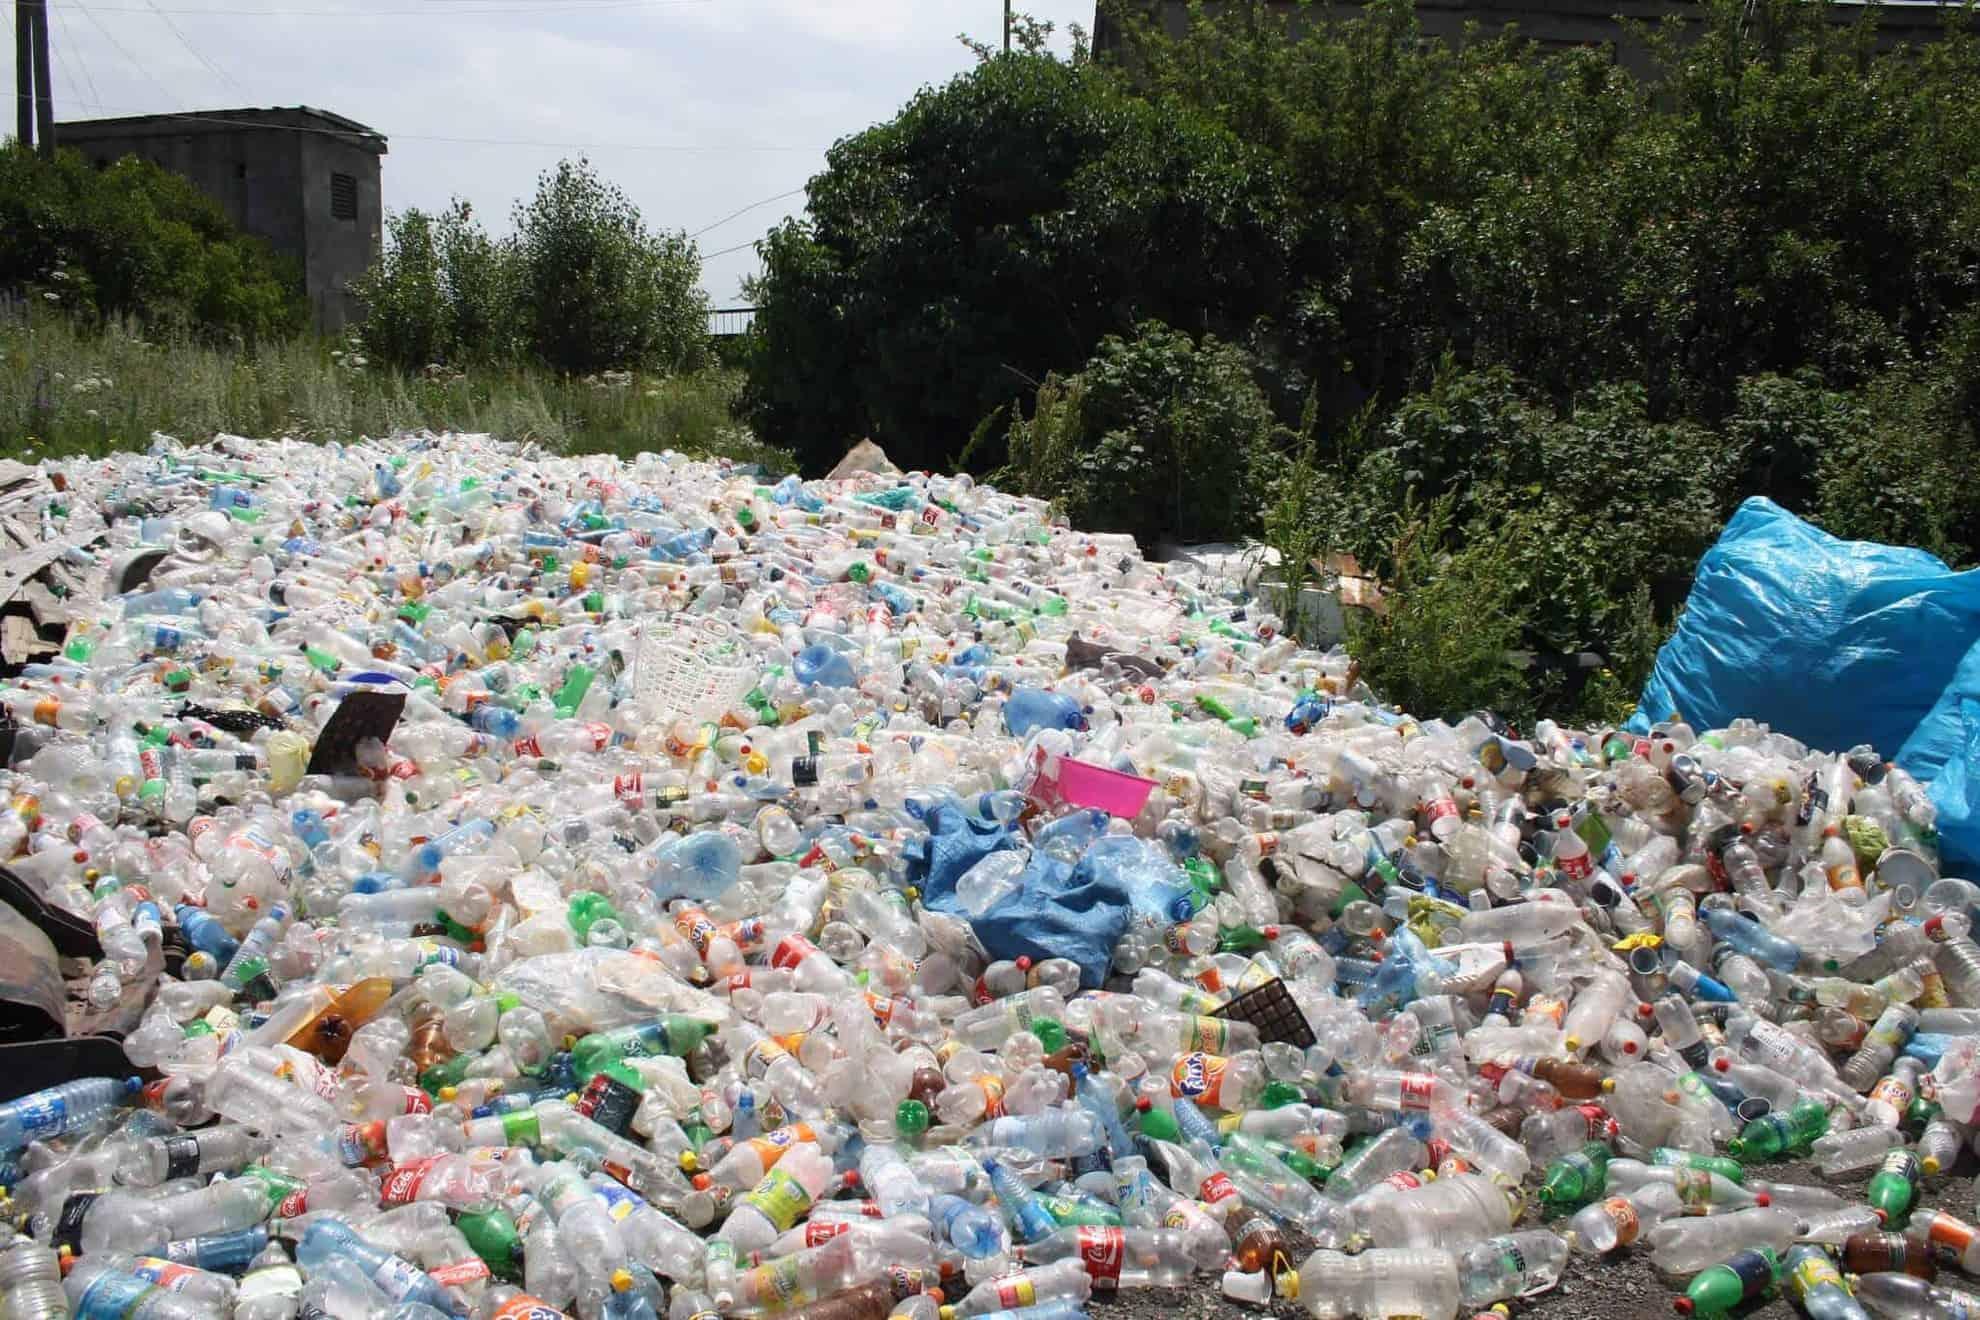 residuos plásticos de un solo uso